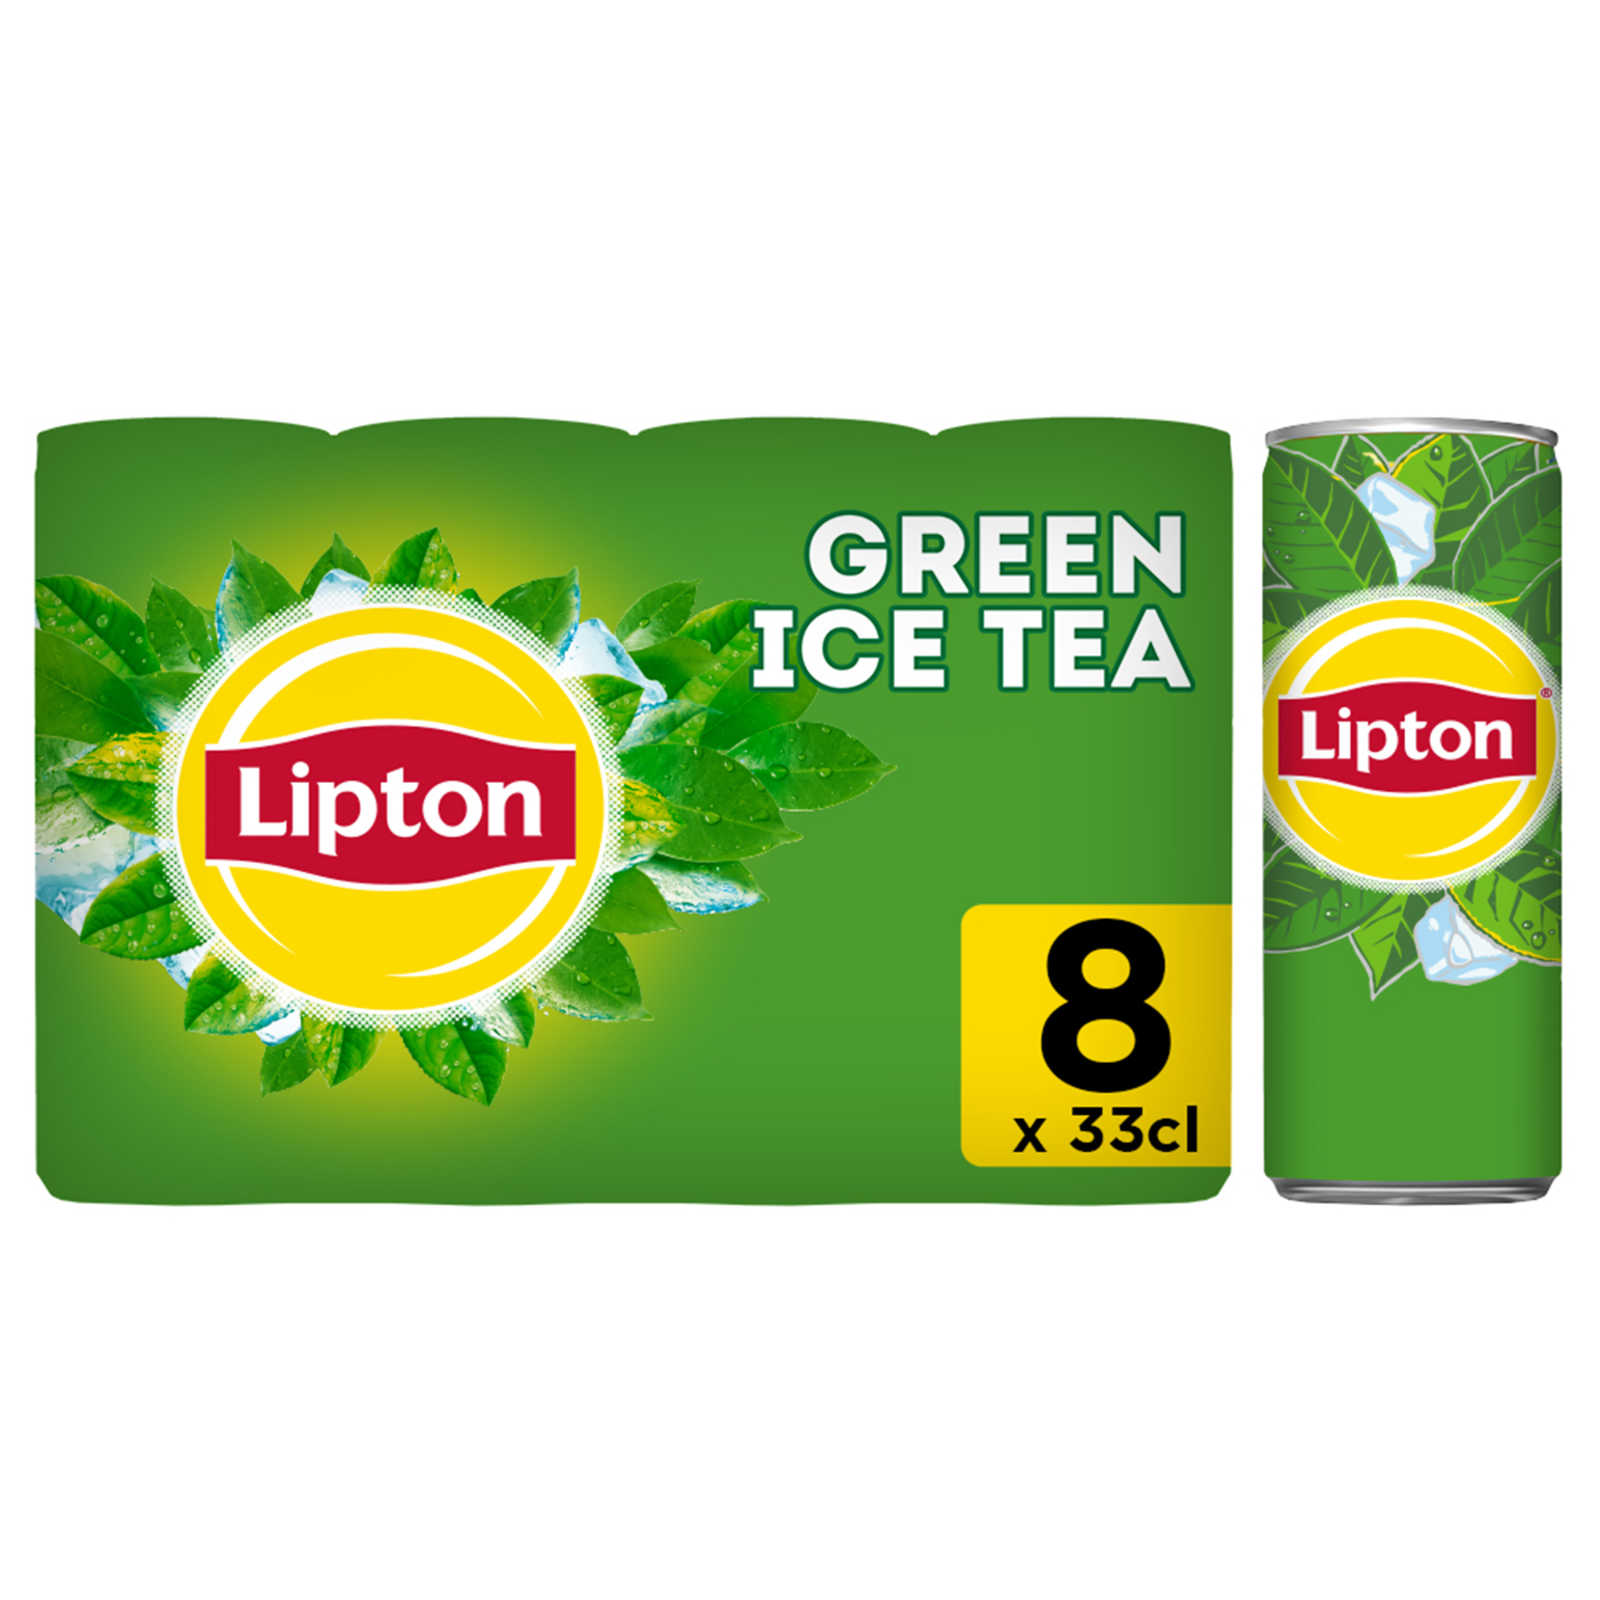 Lipton-Green Tea